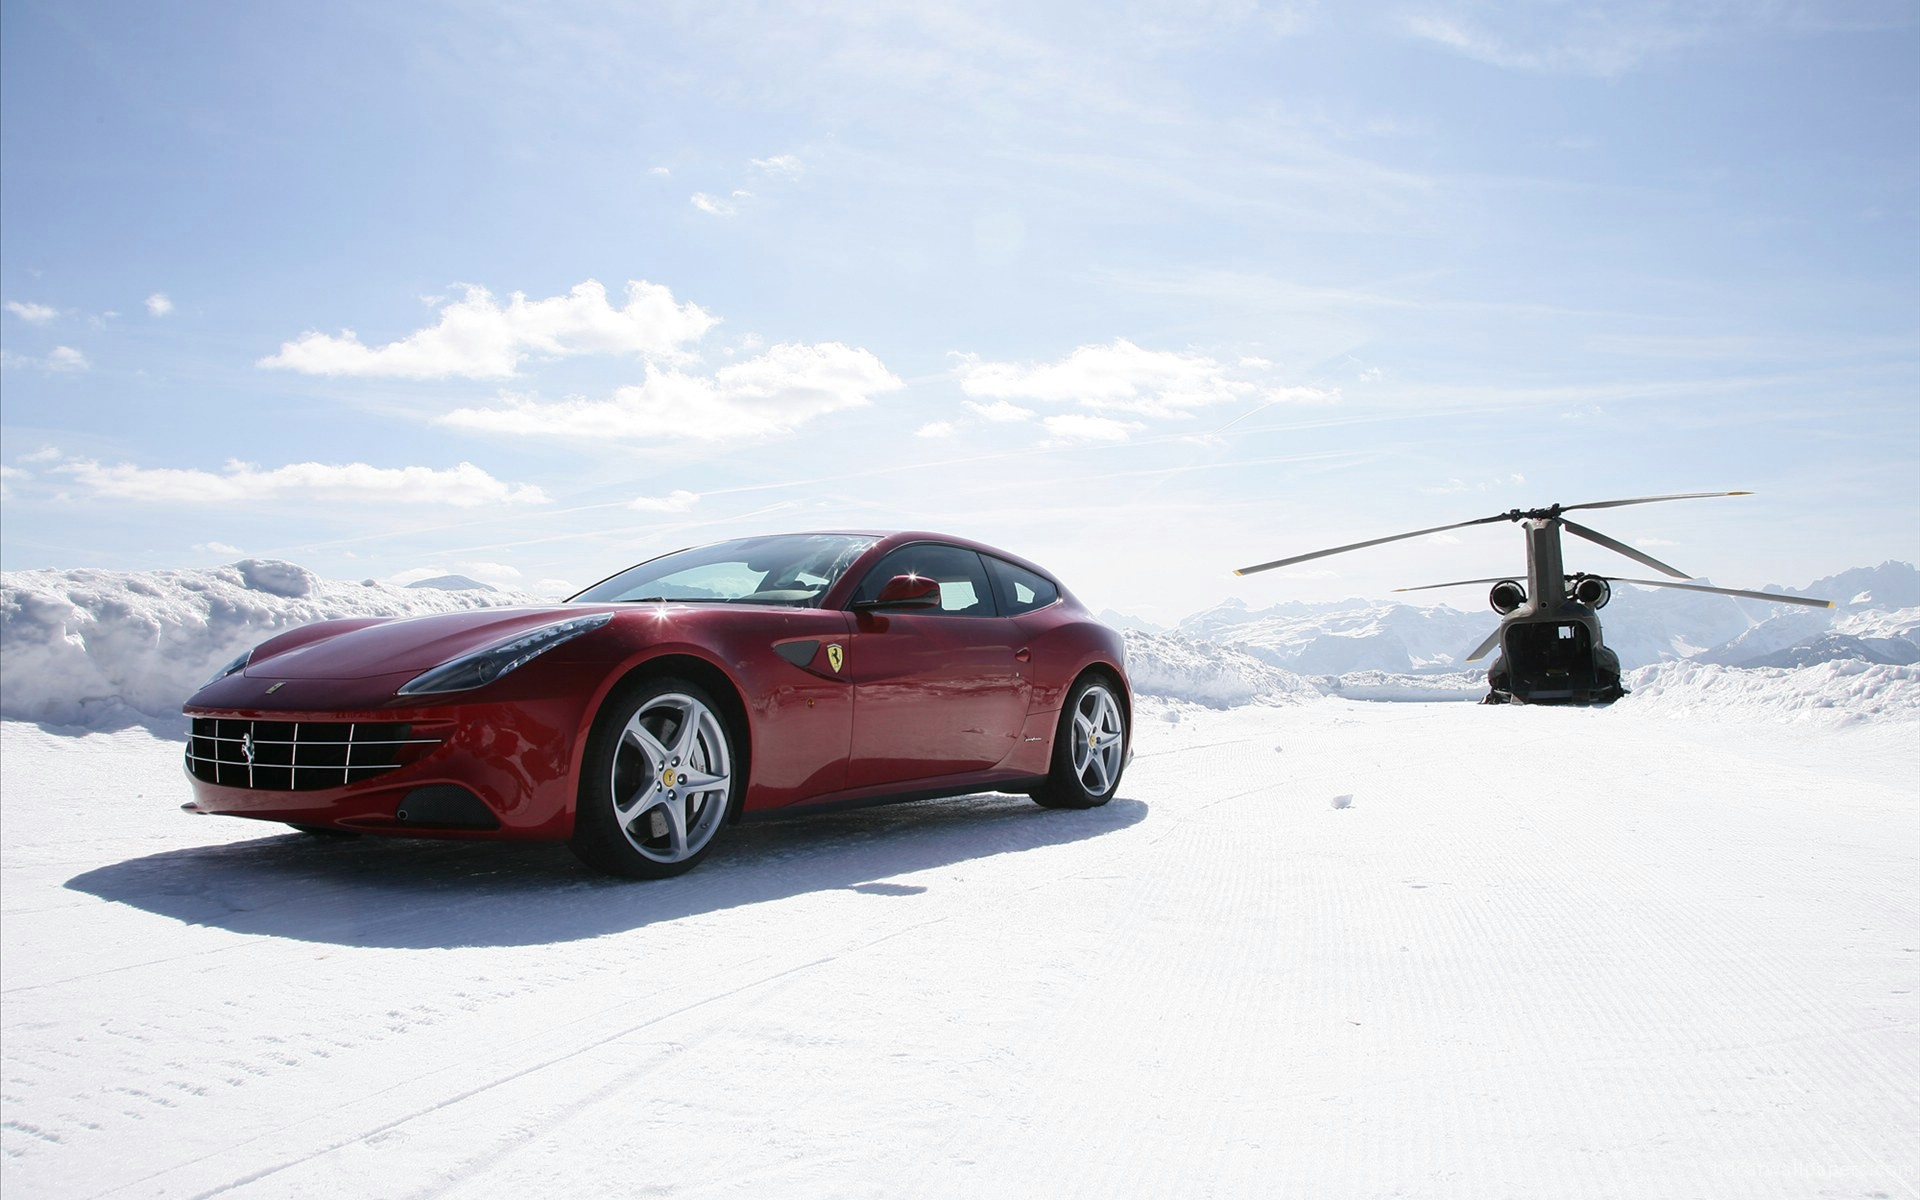 2012 Ferrari FF Wallpaper